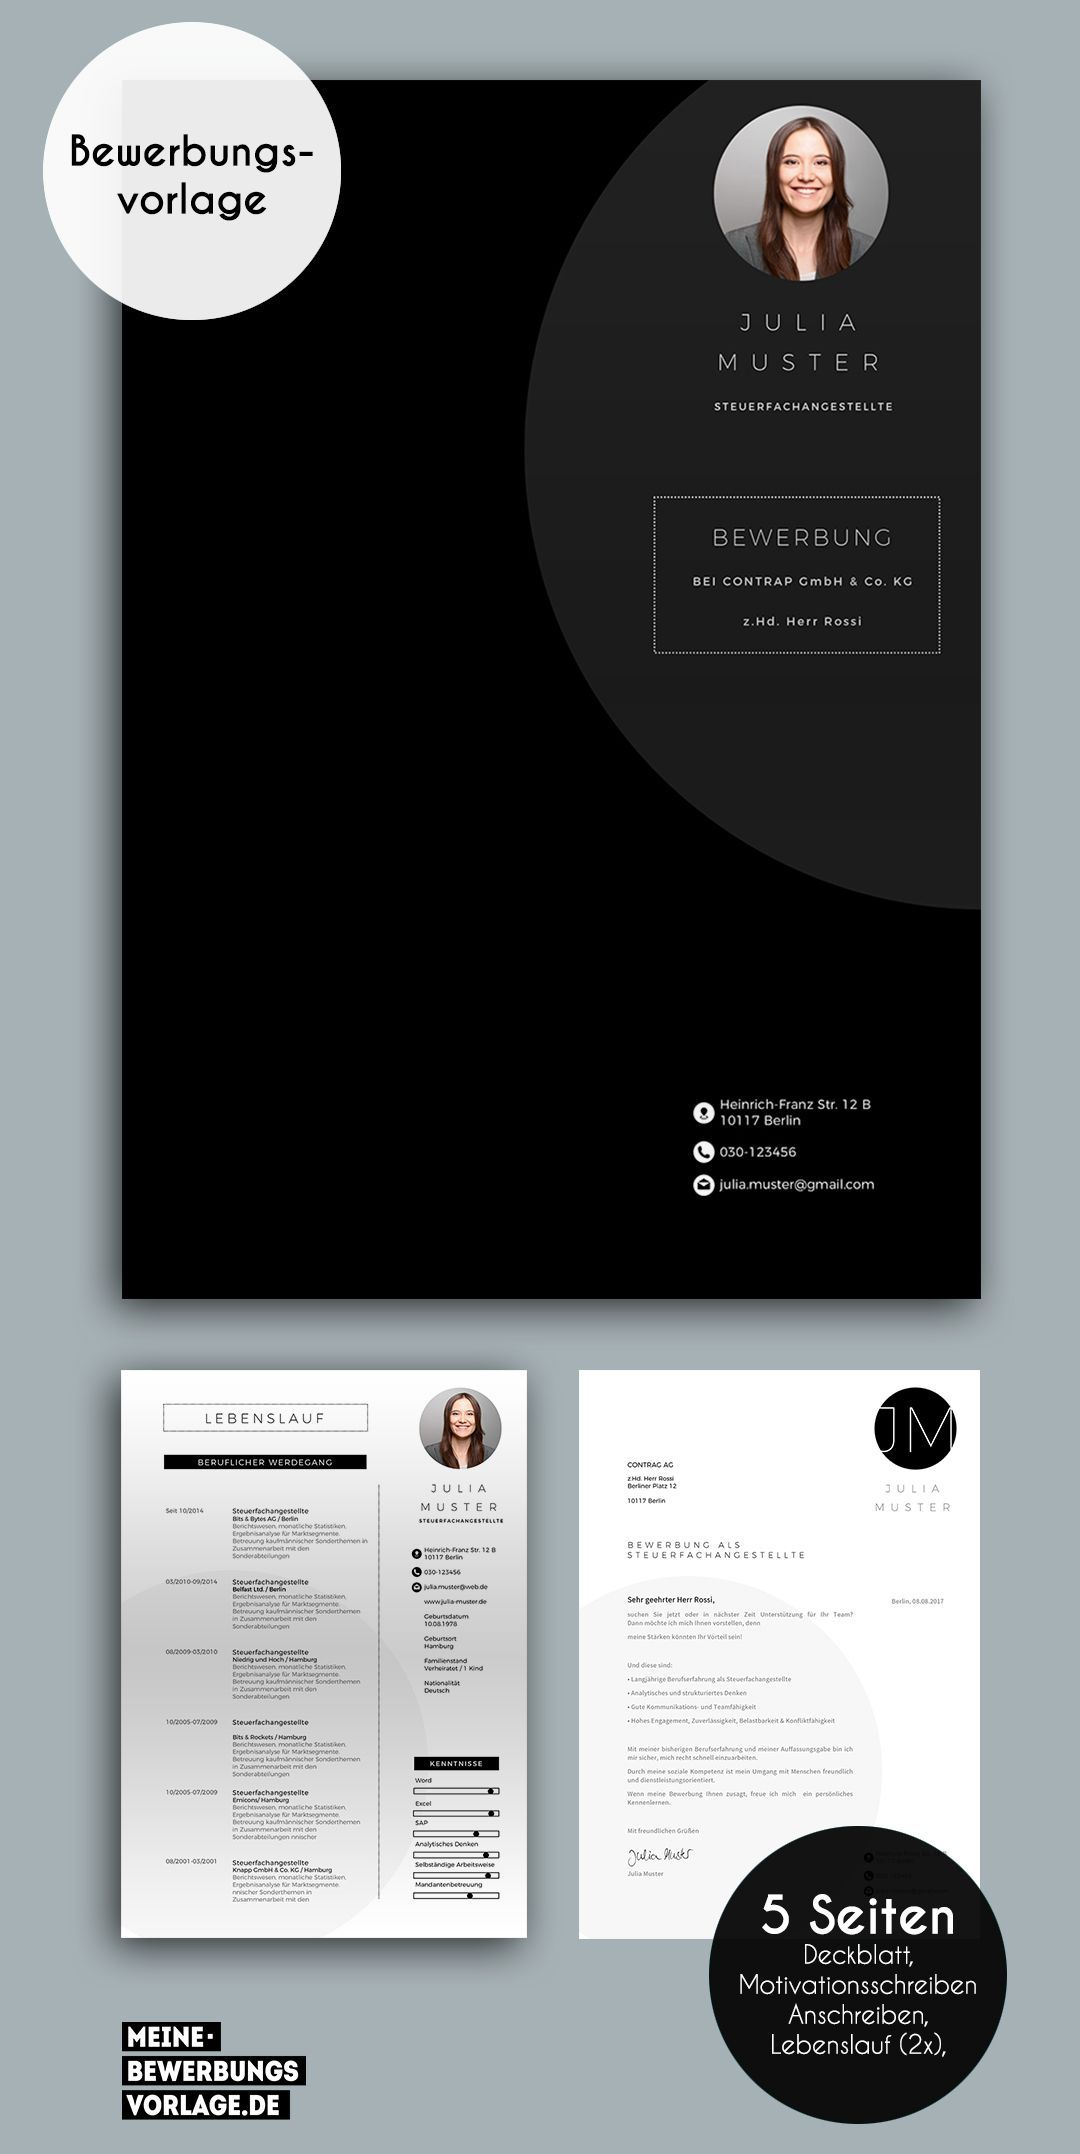 26 Lebenslauf Design Microsoft Word In 2020 Resume Design Creative Resume Design Template Infographic Resume